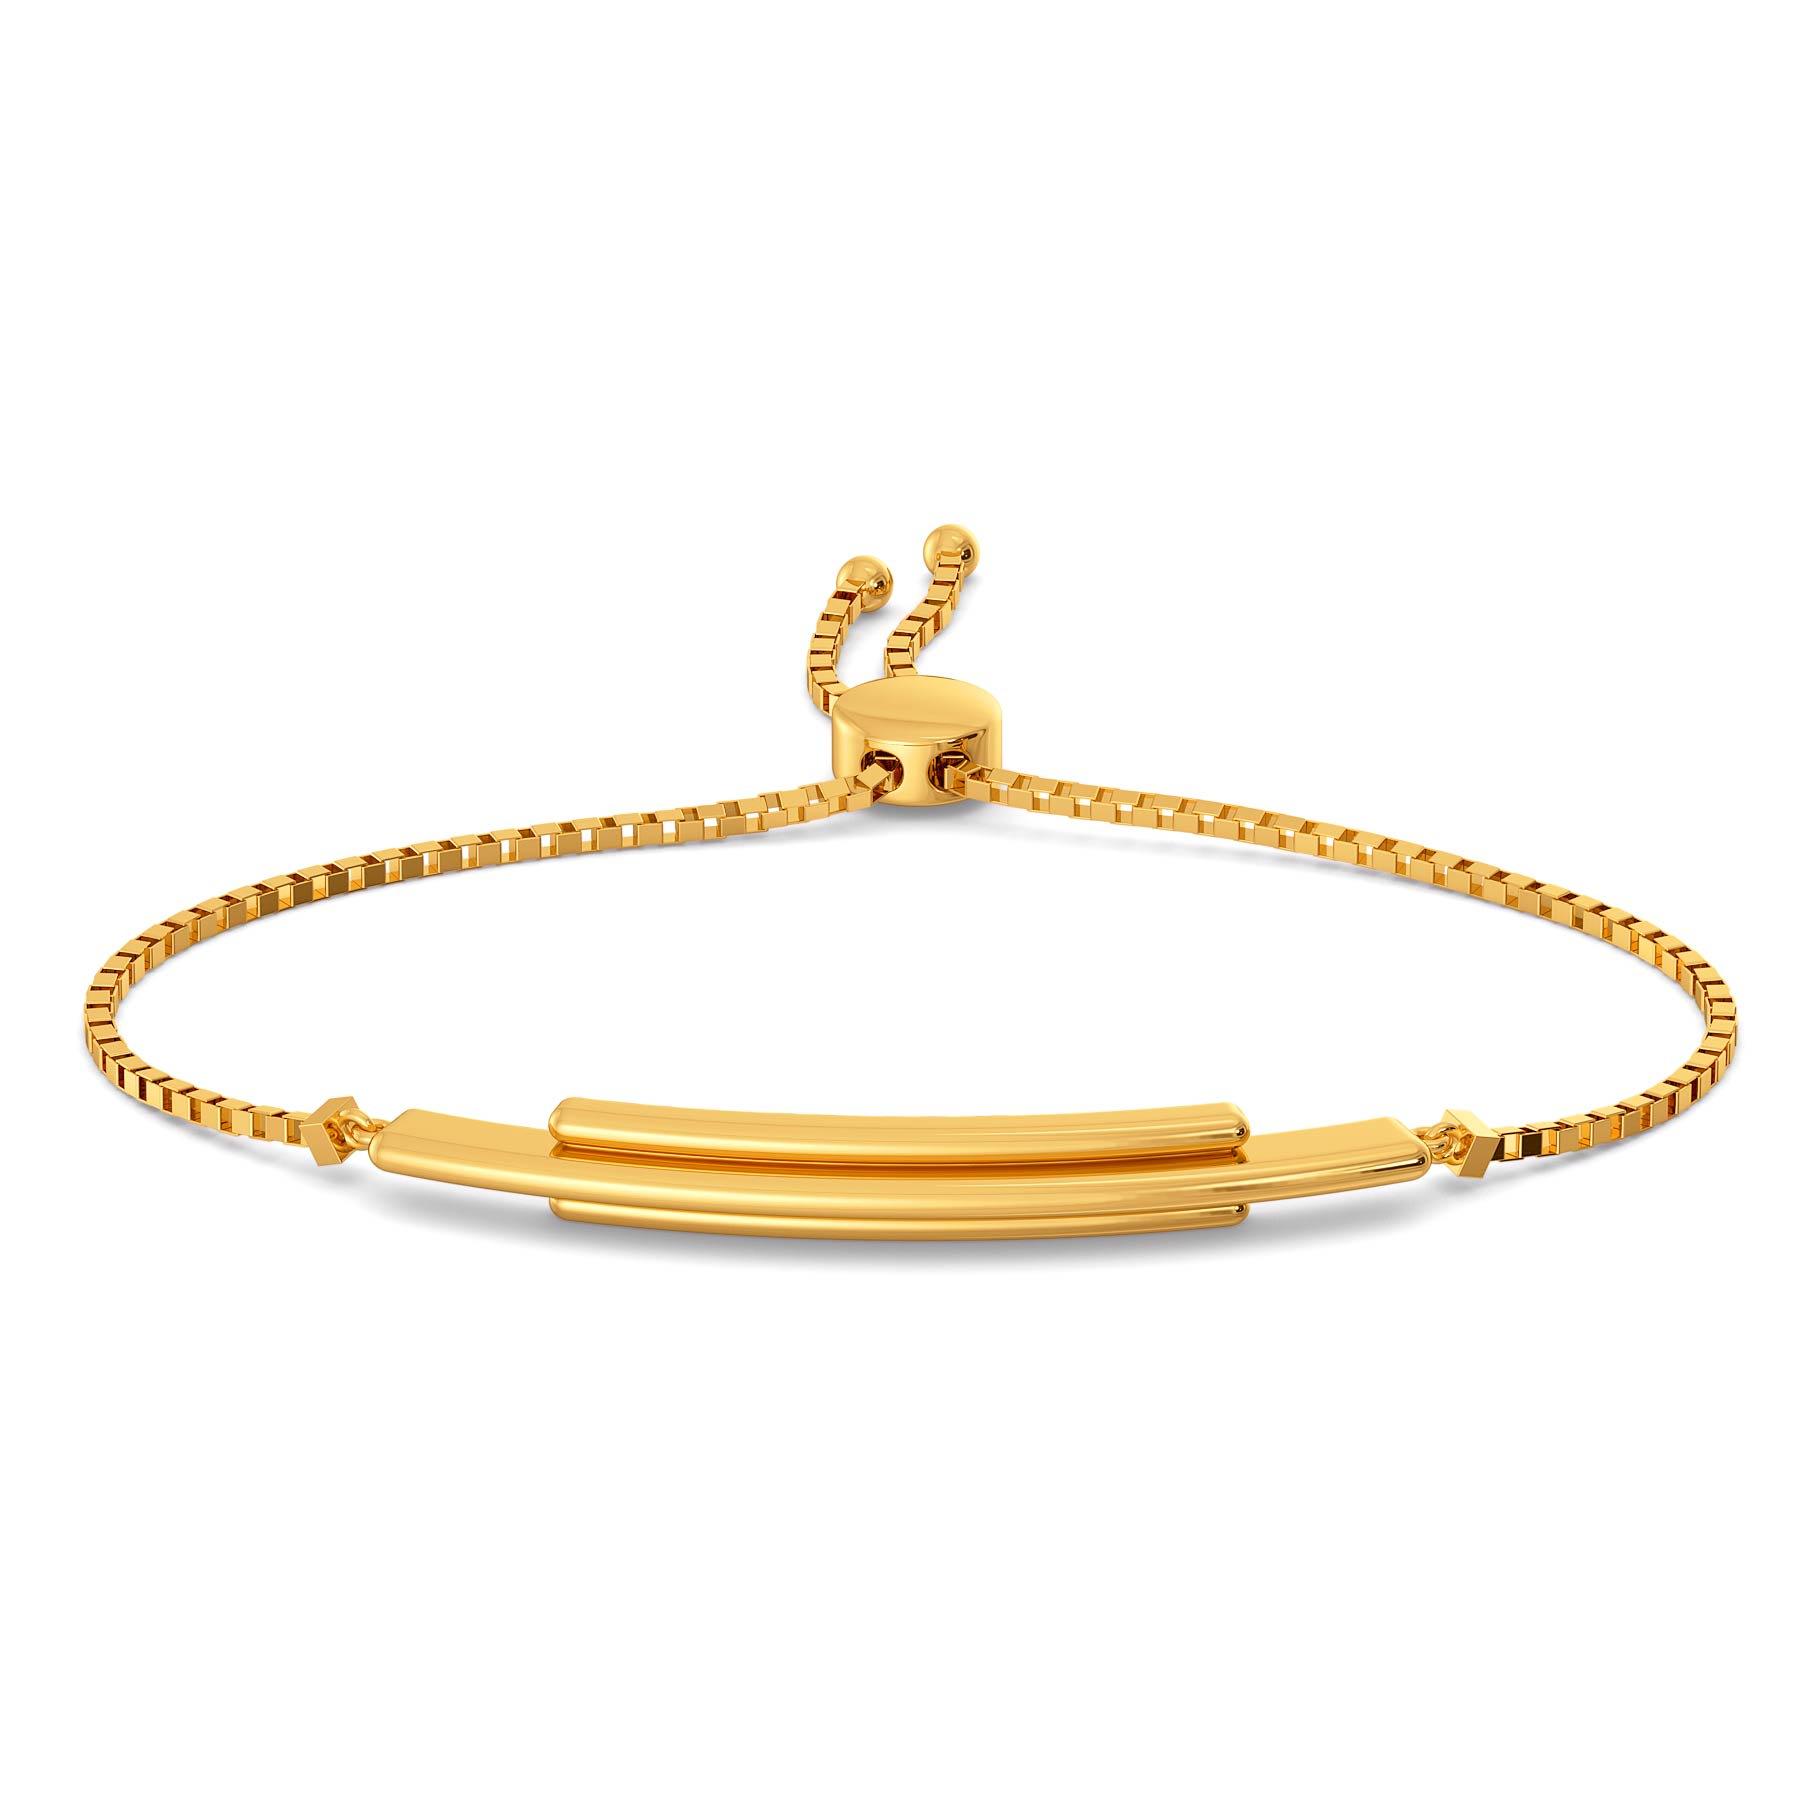 Streaks of gold bracelet